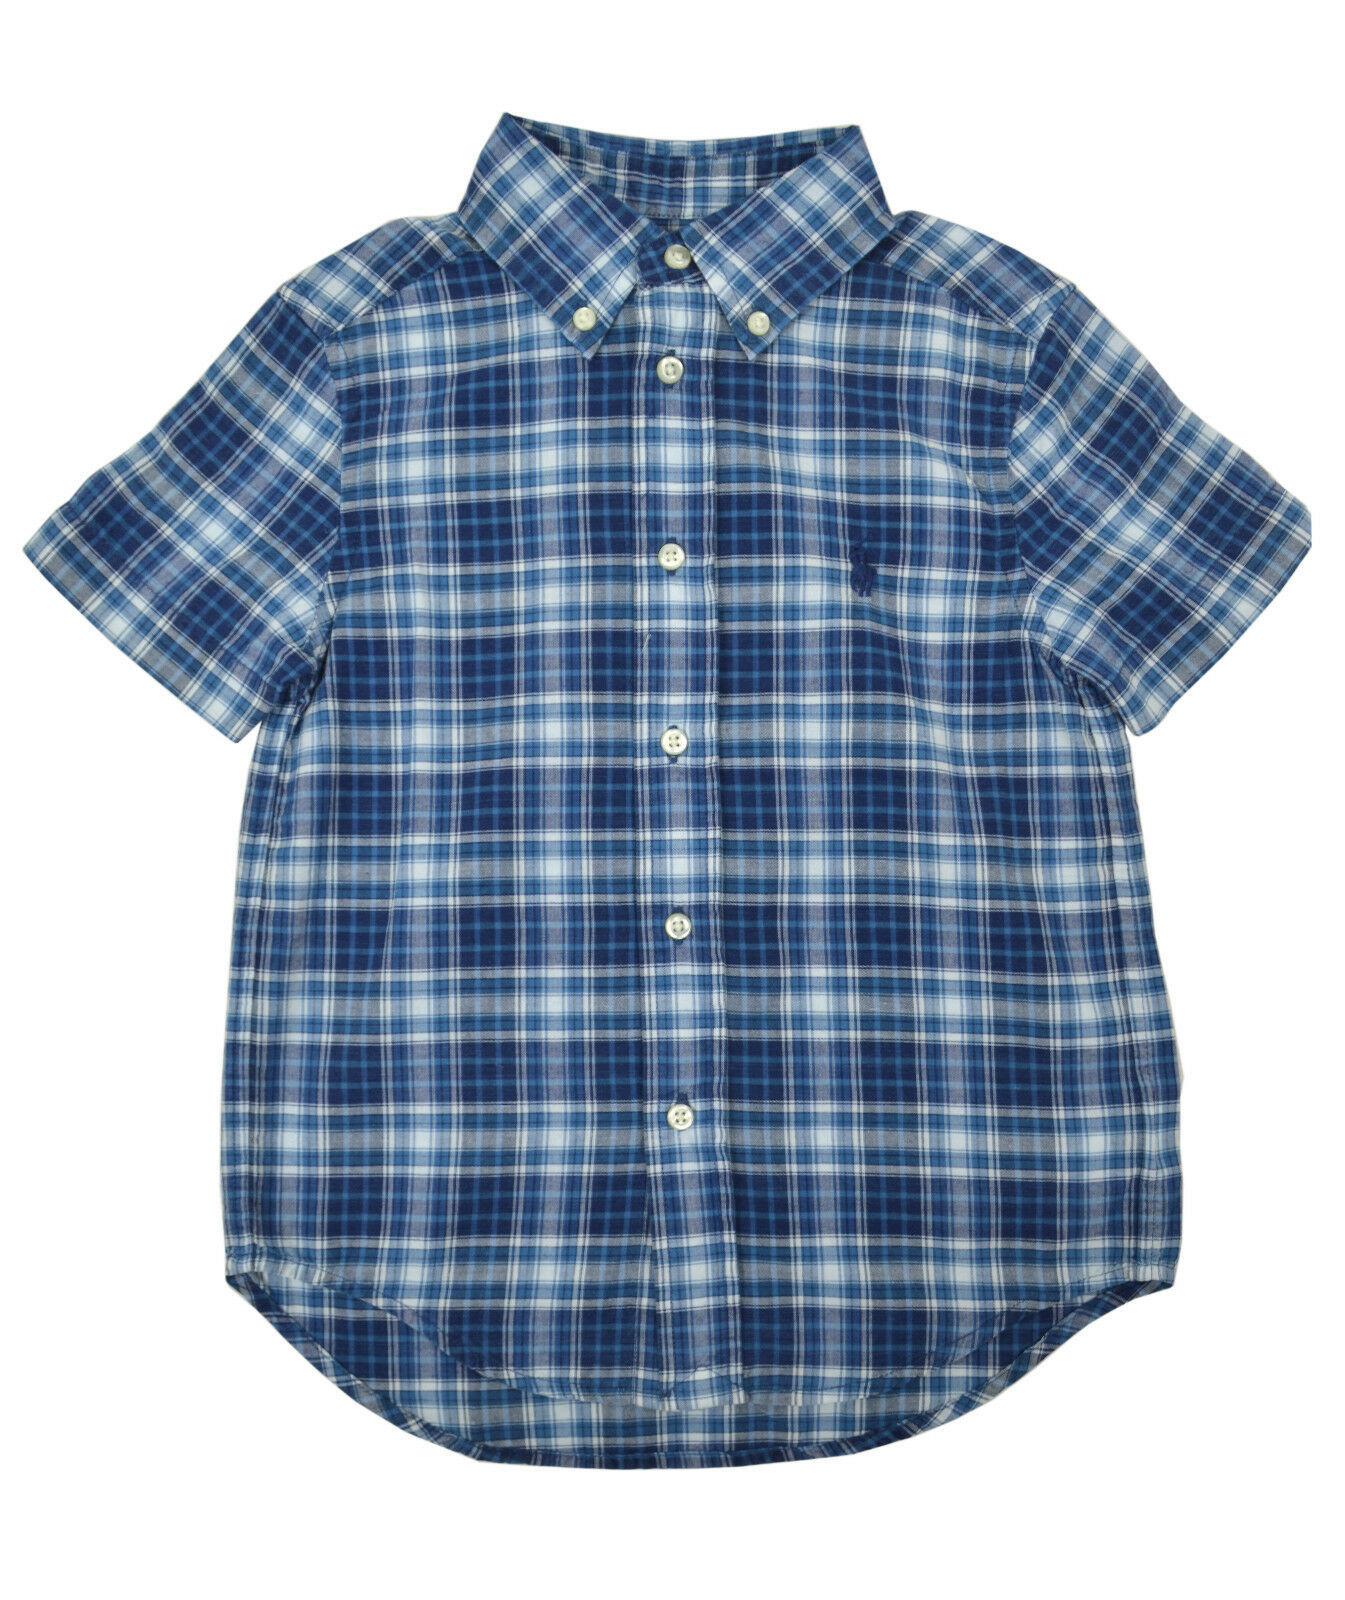 NWT Ralph Lauren Toddler Boys S//S Big Pony Solid Mesh Polo Shirt Sz 2t 3t 4t NEW